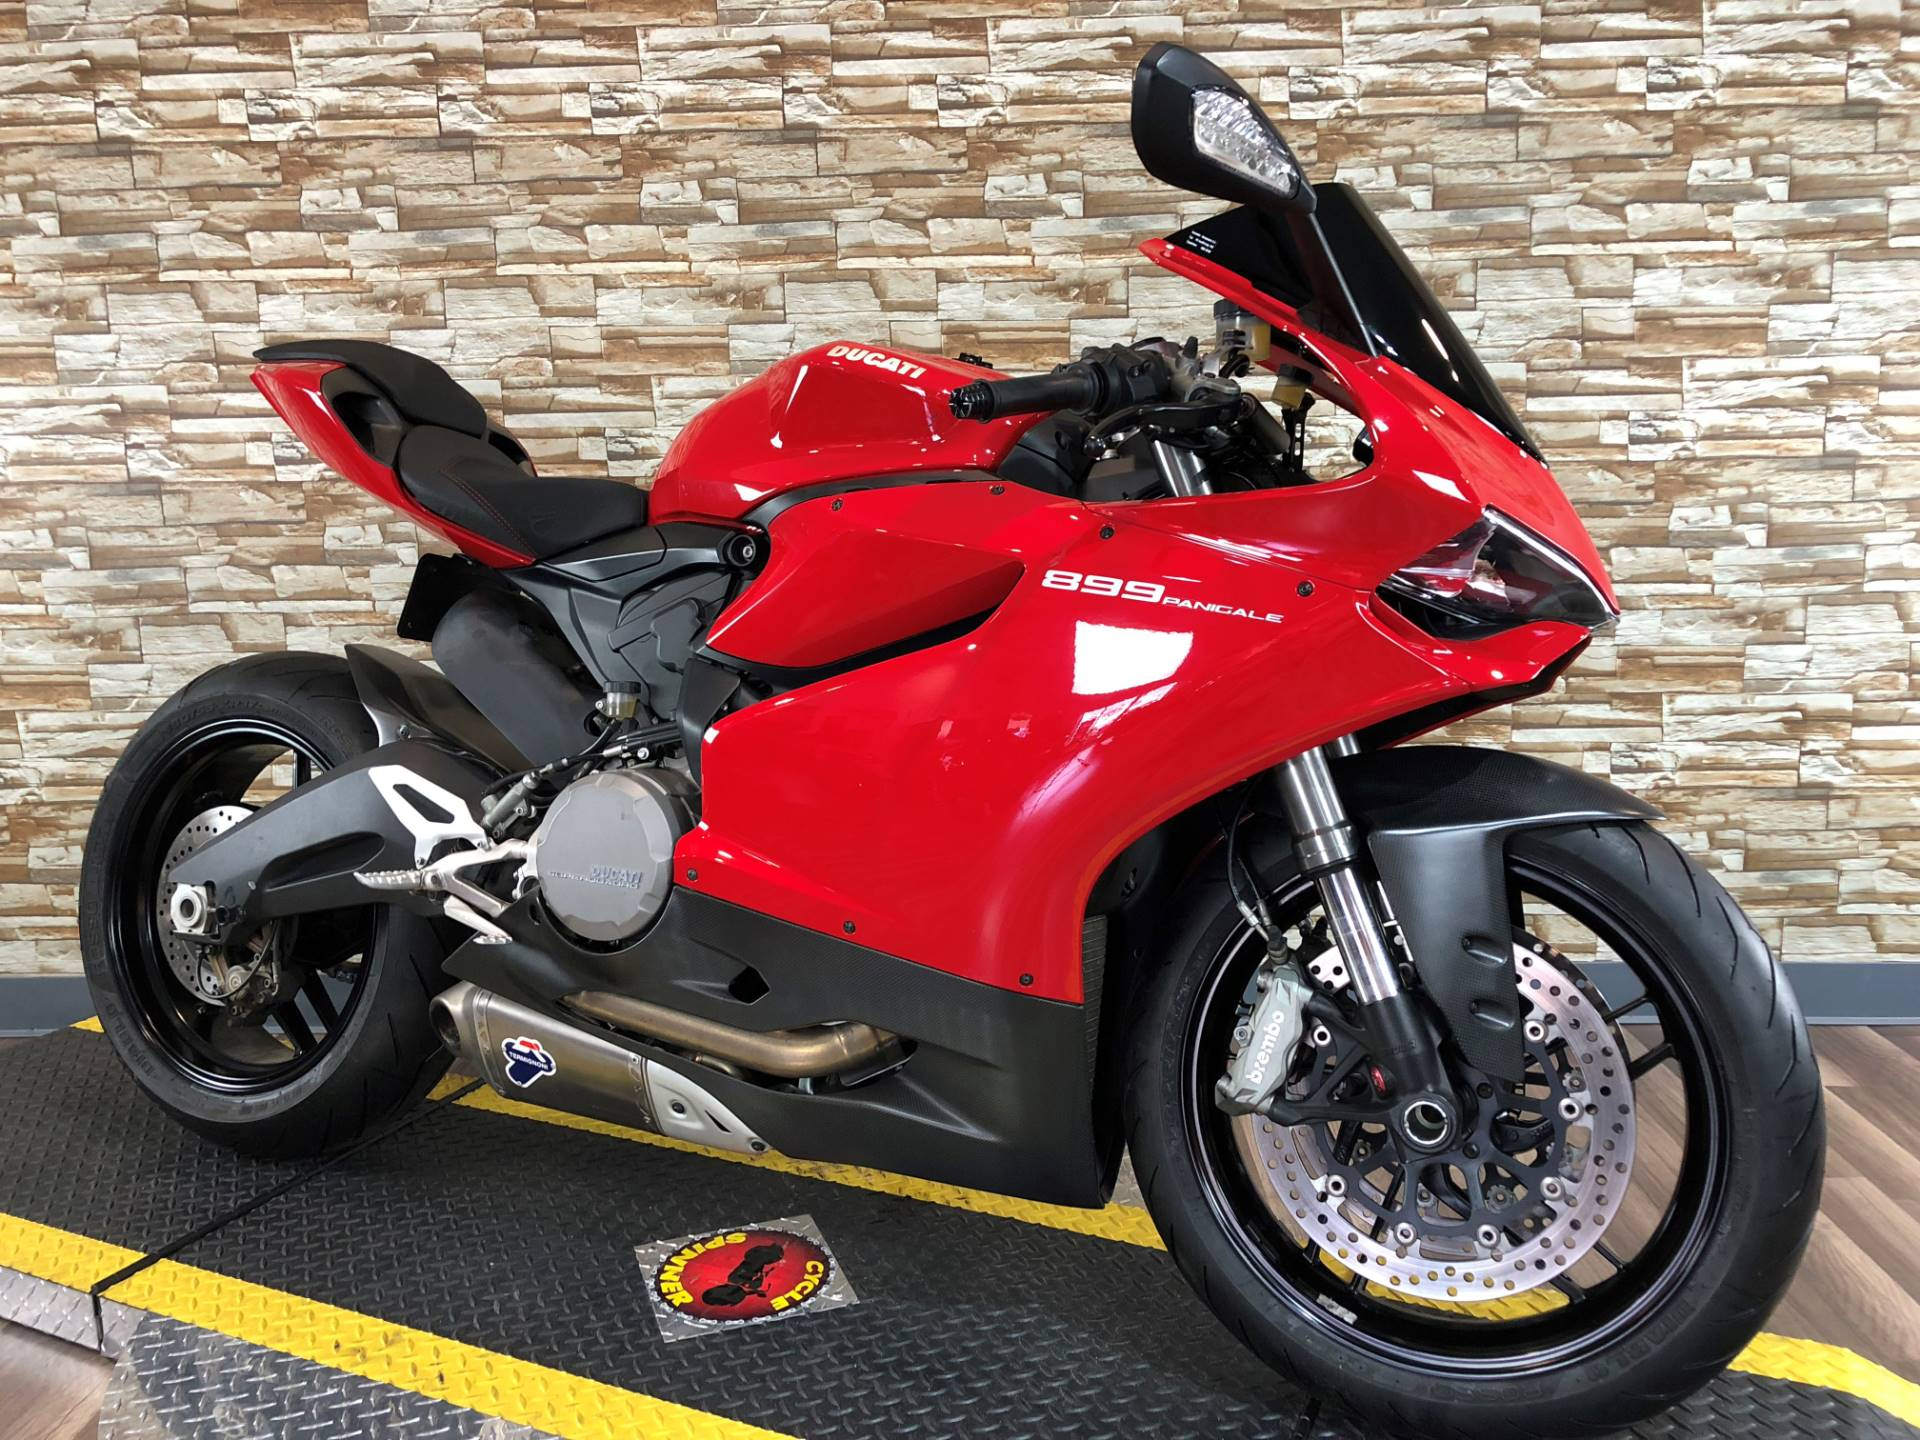 2014 Ducati Superbike 899 Panigale 8